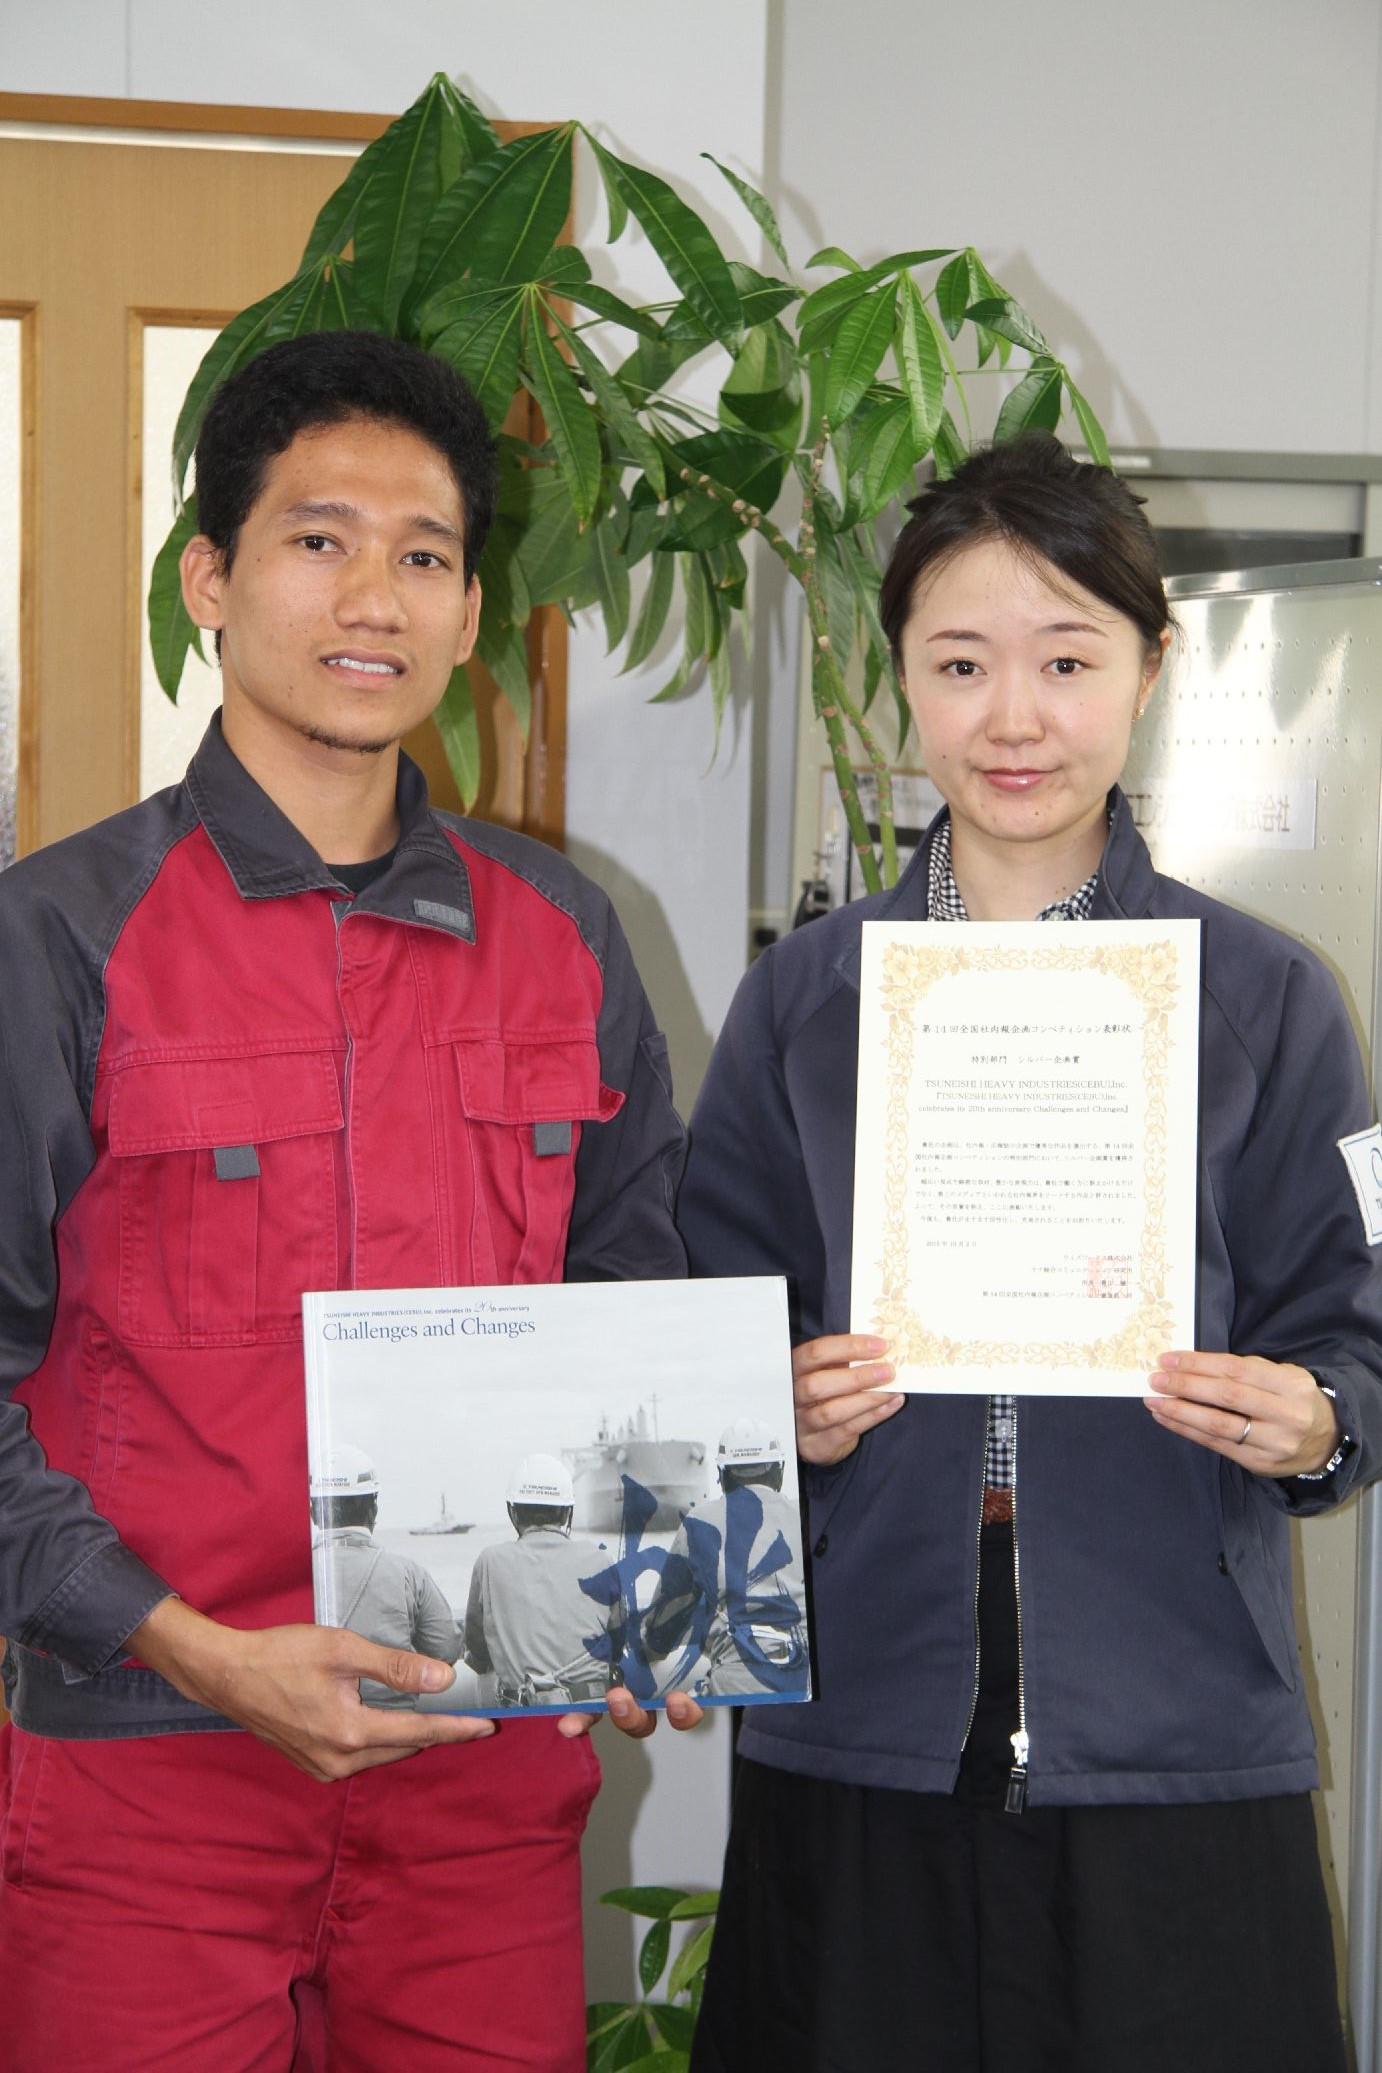 TSUNEISHI HEAVY INDUSTRIES (CEBU), Inc.の設立20周年の記念誌『Challenges & Changes』が、第14回全国社内報企画コンペティションで「シルバー企画賞」を受賞!